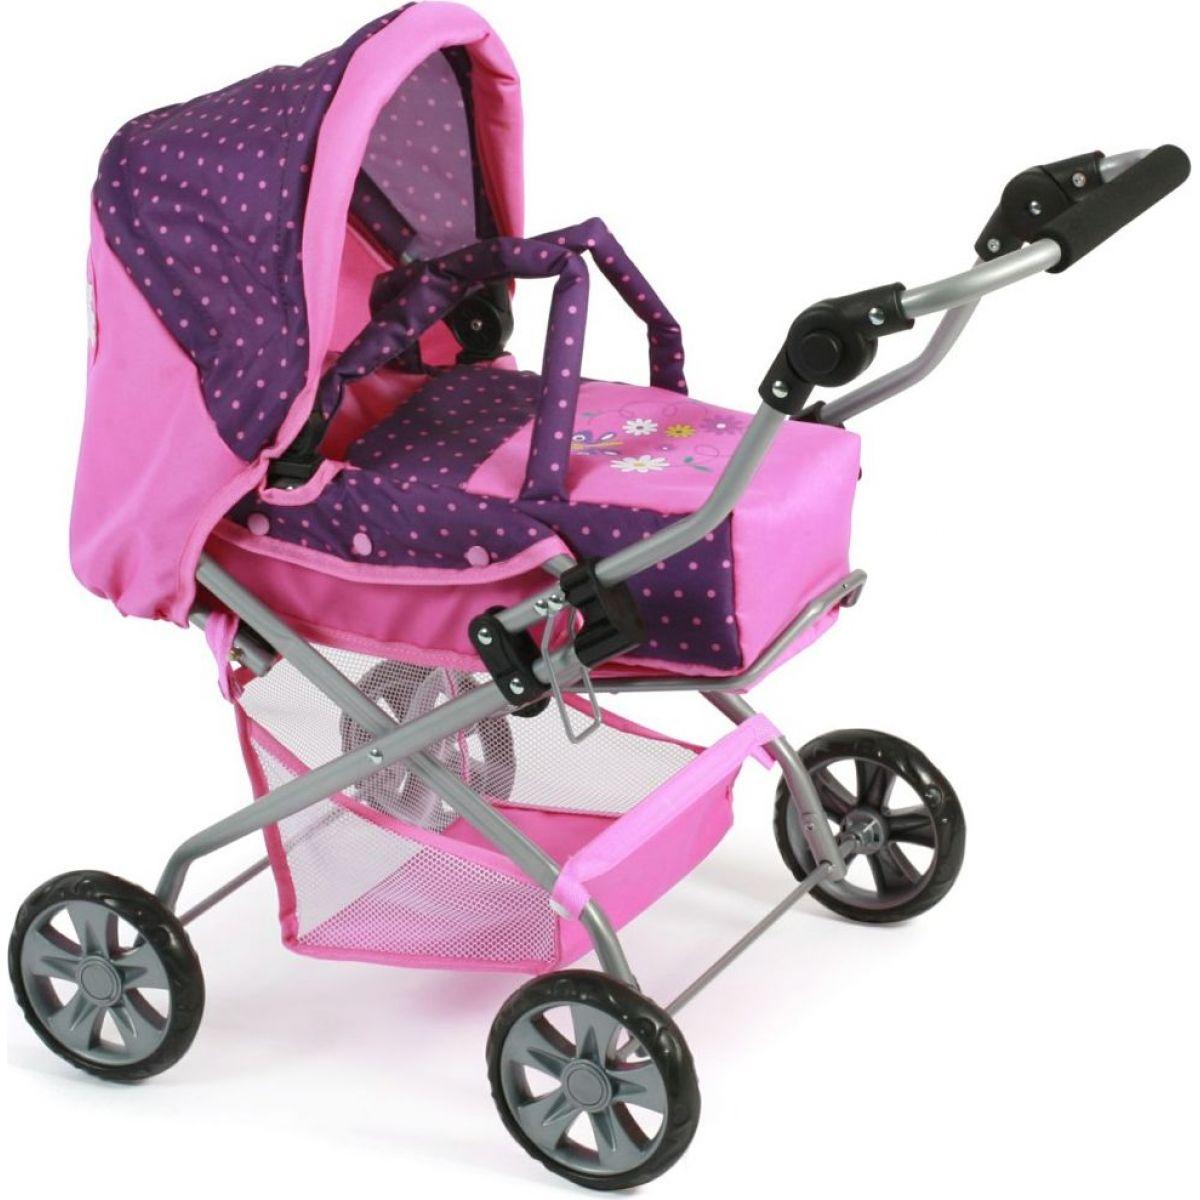 Bayer Chic Piccolina - Dots purple pink